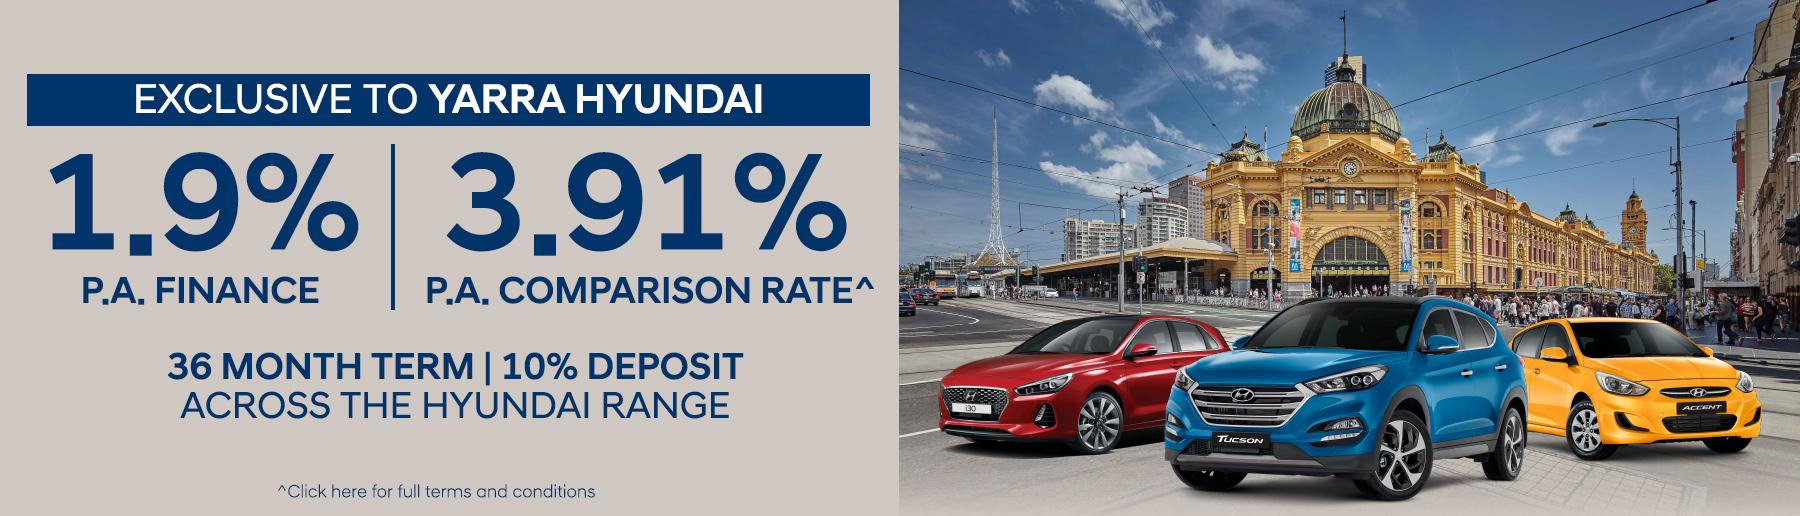 Yarra Hyundai Exclusive Finance Offer